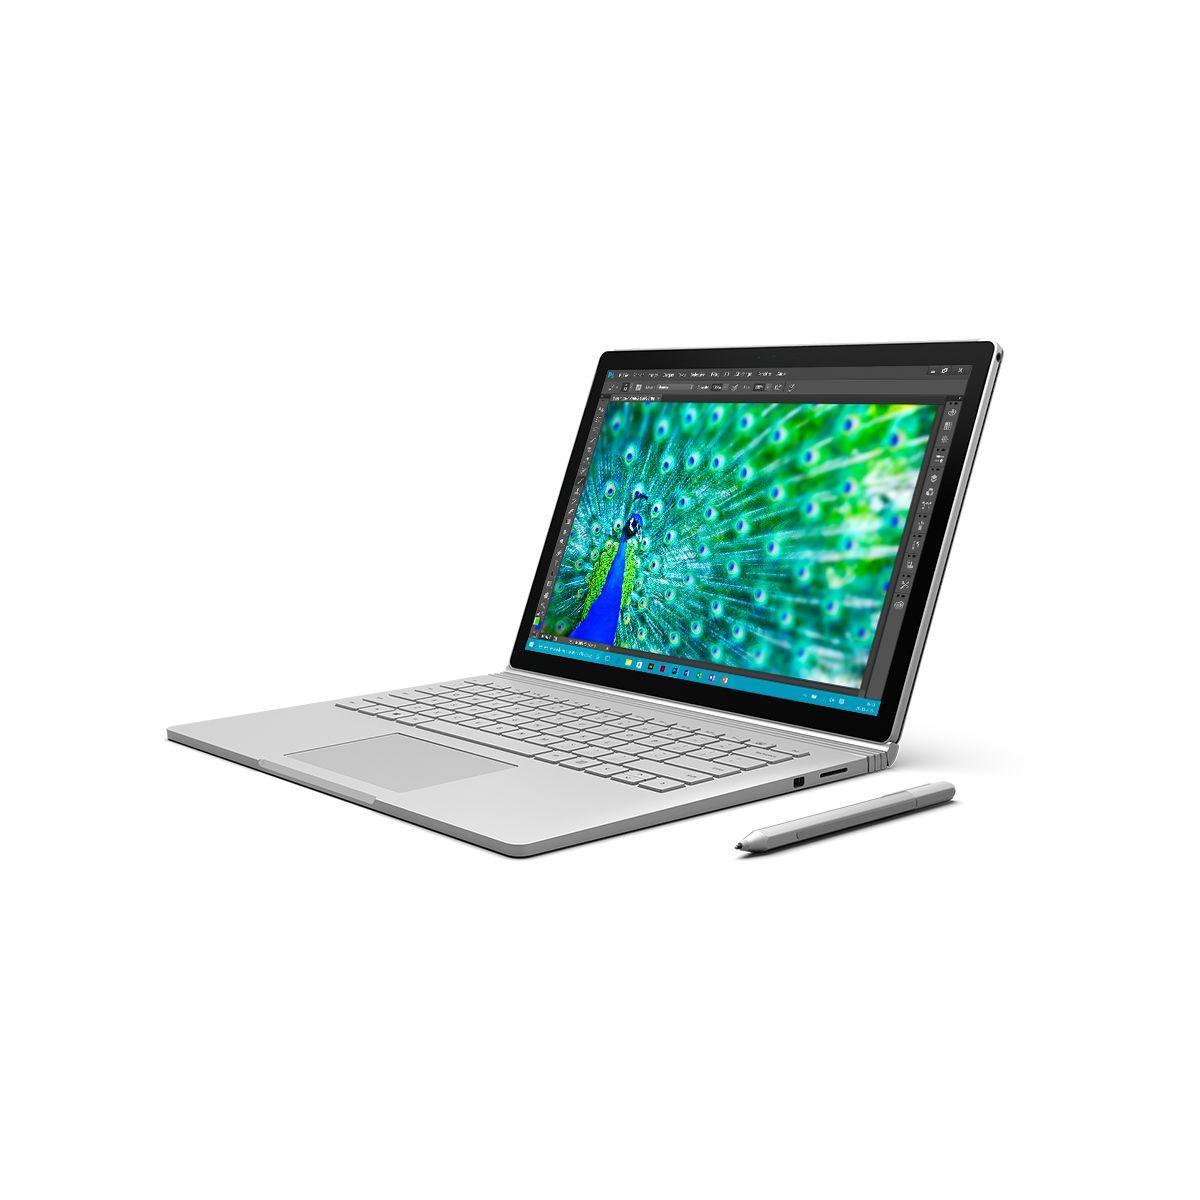 Microsoft surface book 256go intel i5 8go (photo)